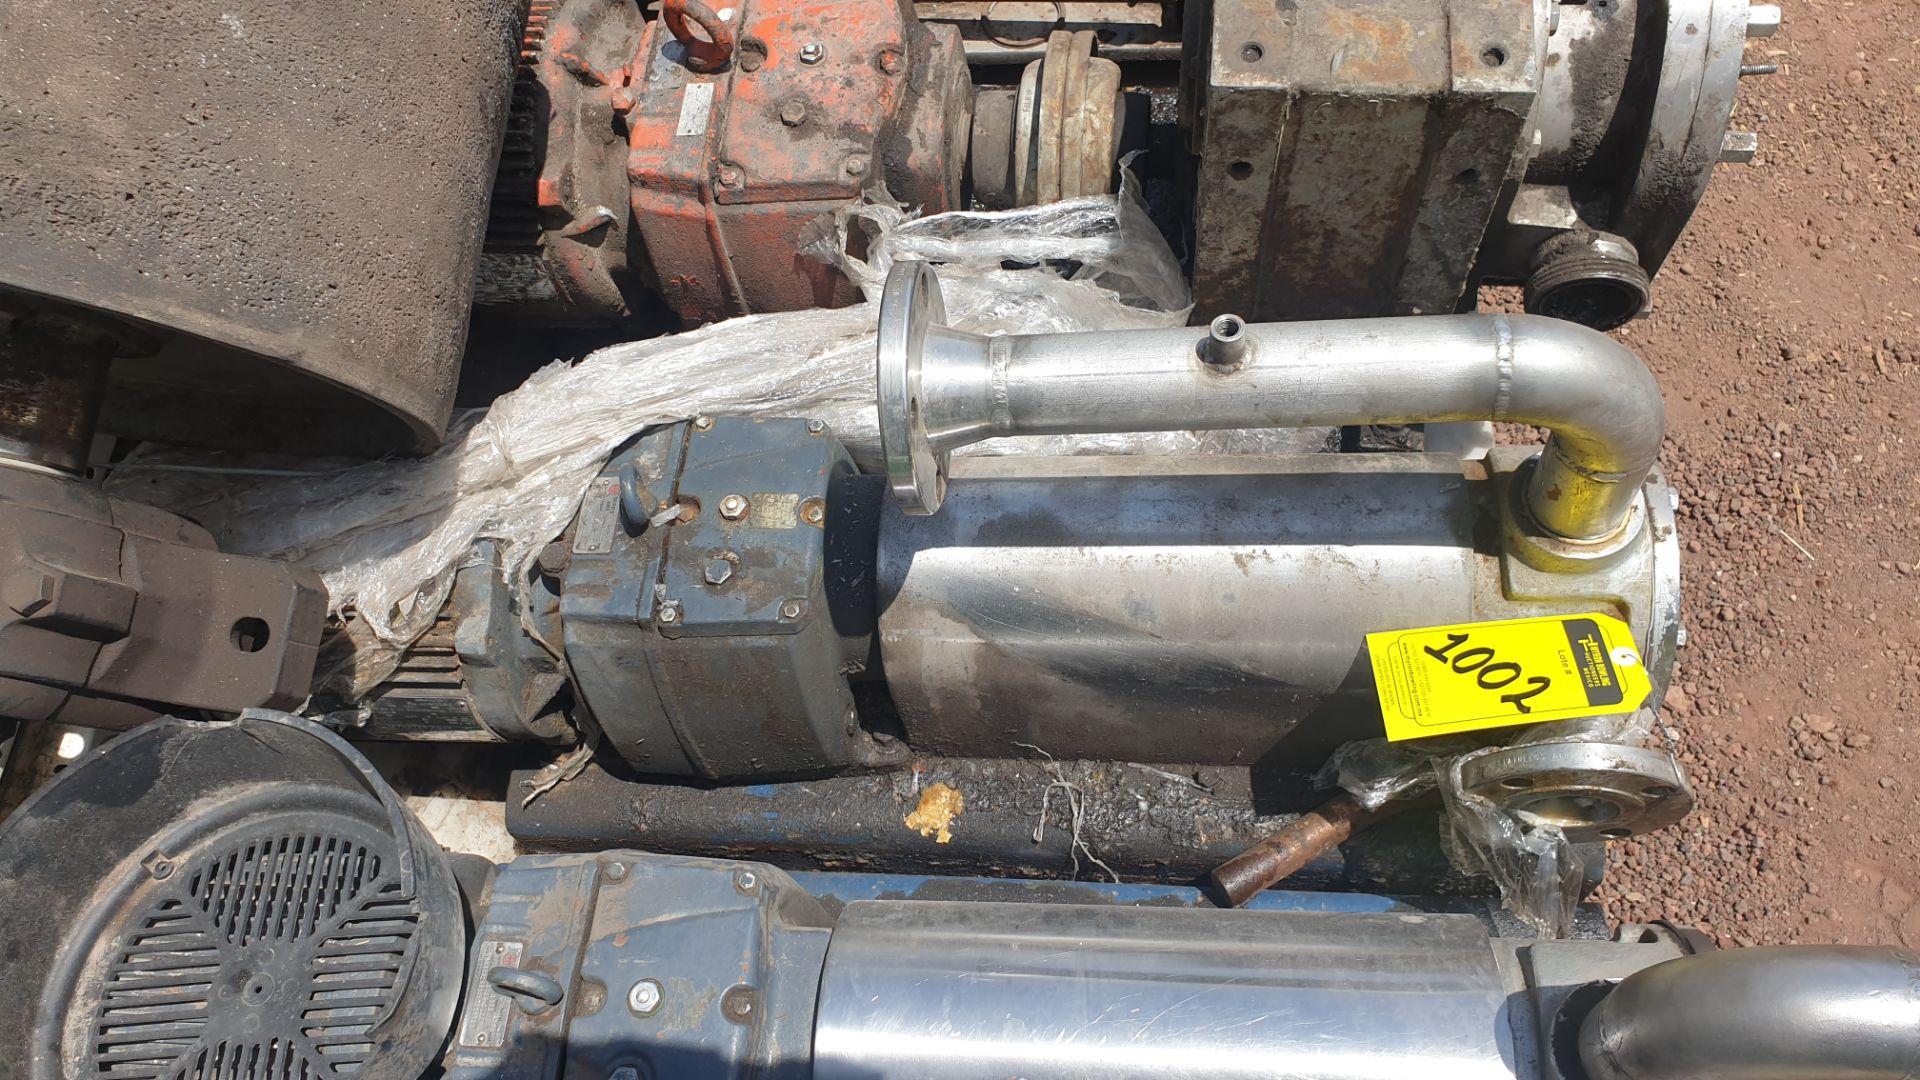 Pneumatic pump, includes emerson motor, model 684982 capacity 10Hp 230v - 460v - Image 4 of 8